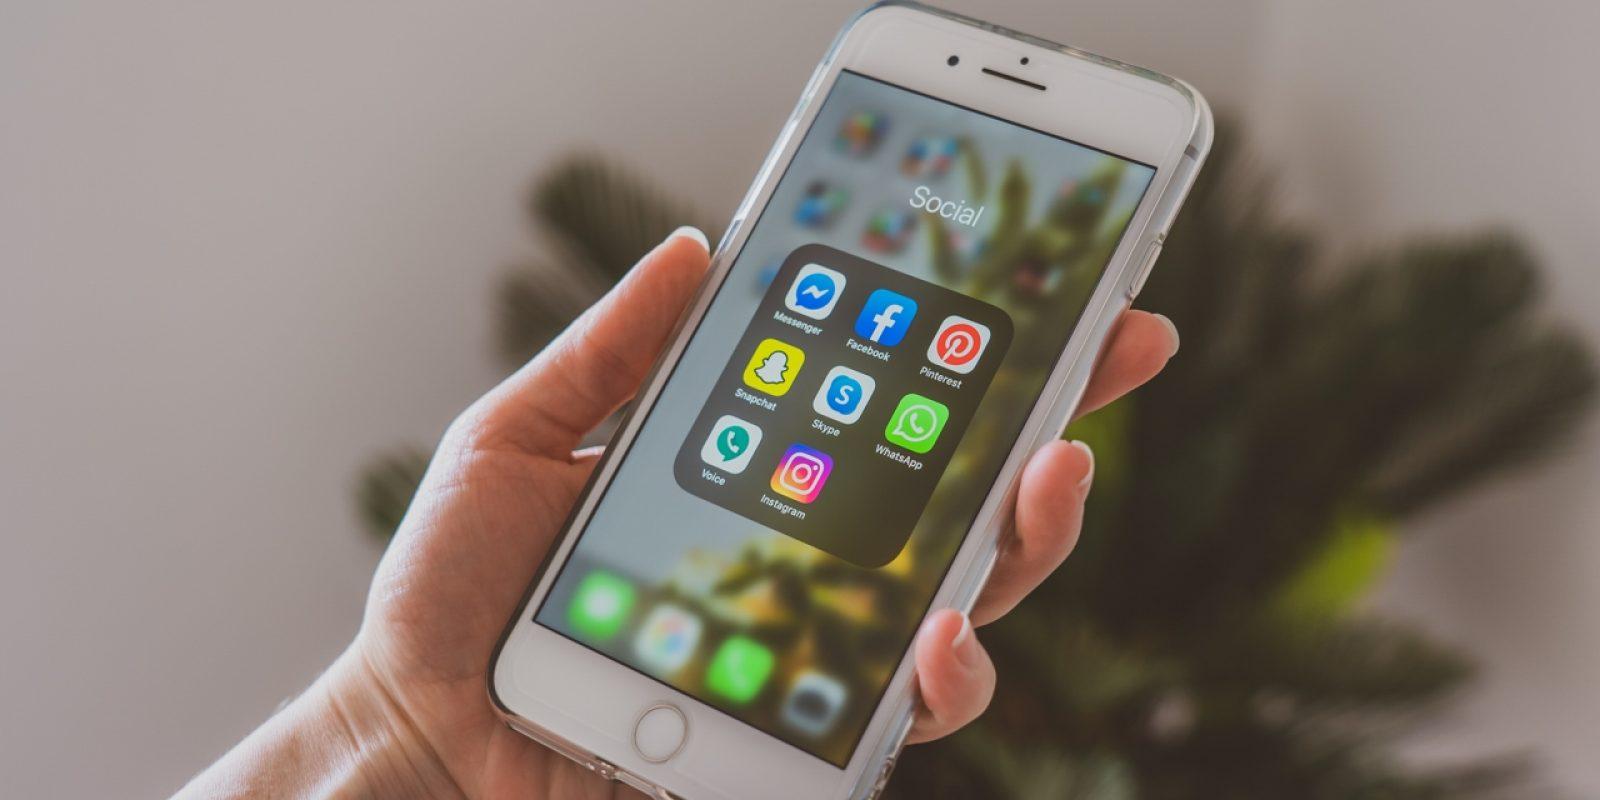 Dcard最多人推薦的5個超好用托福app